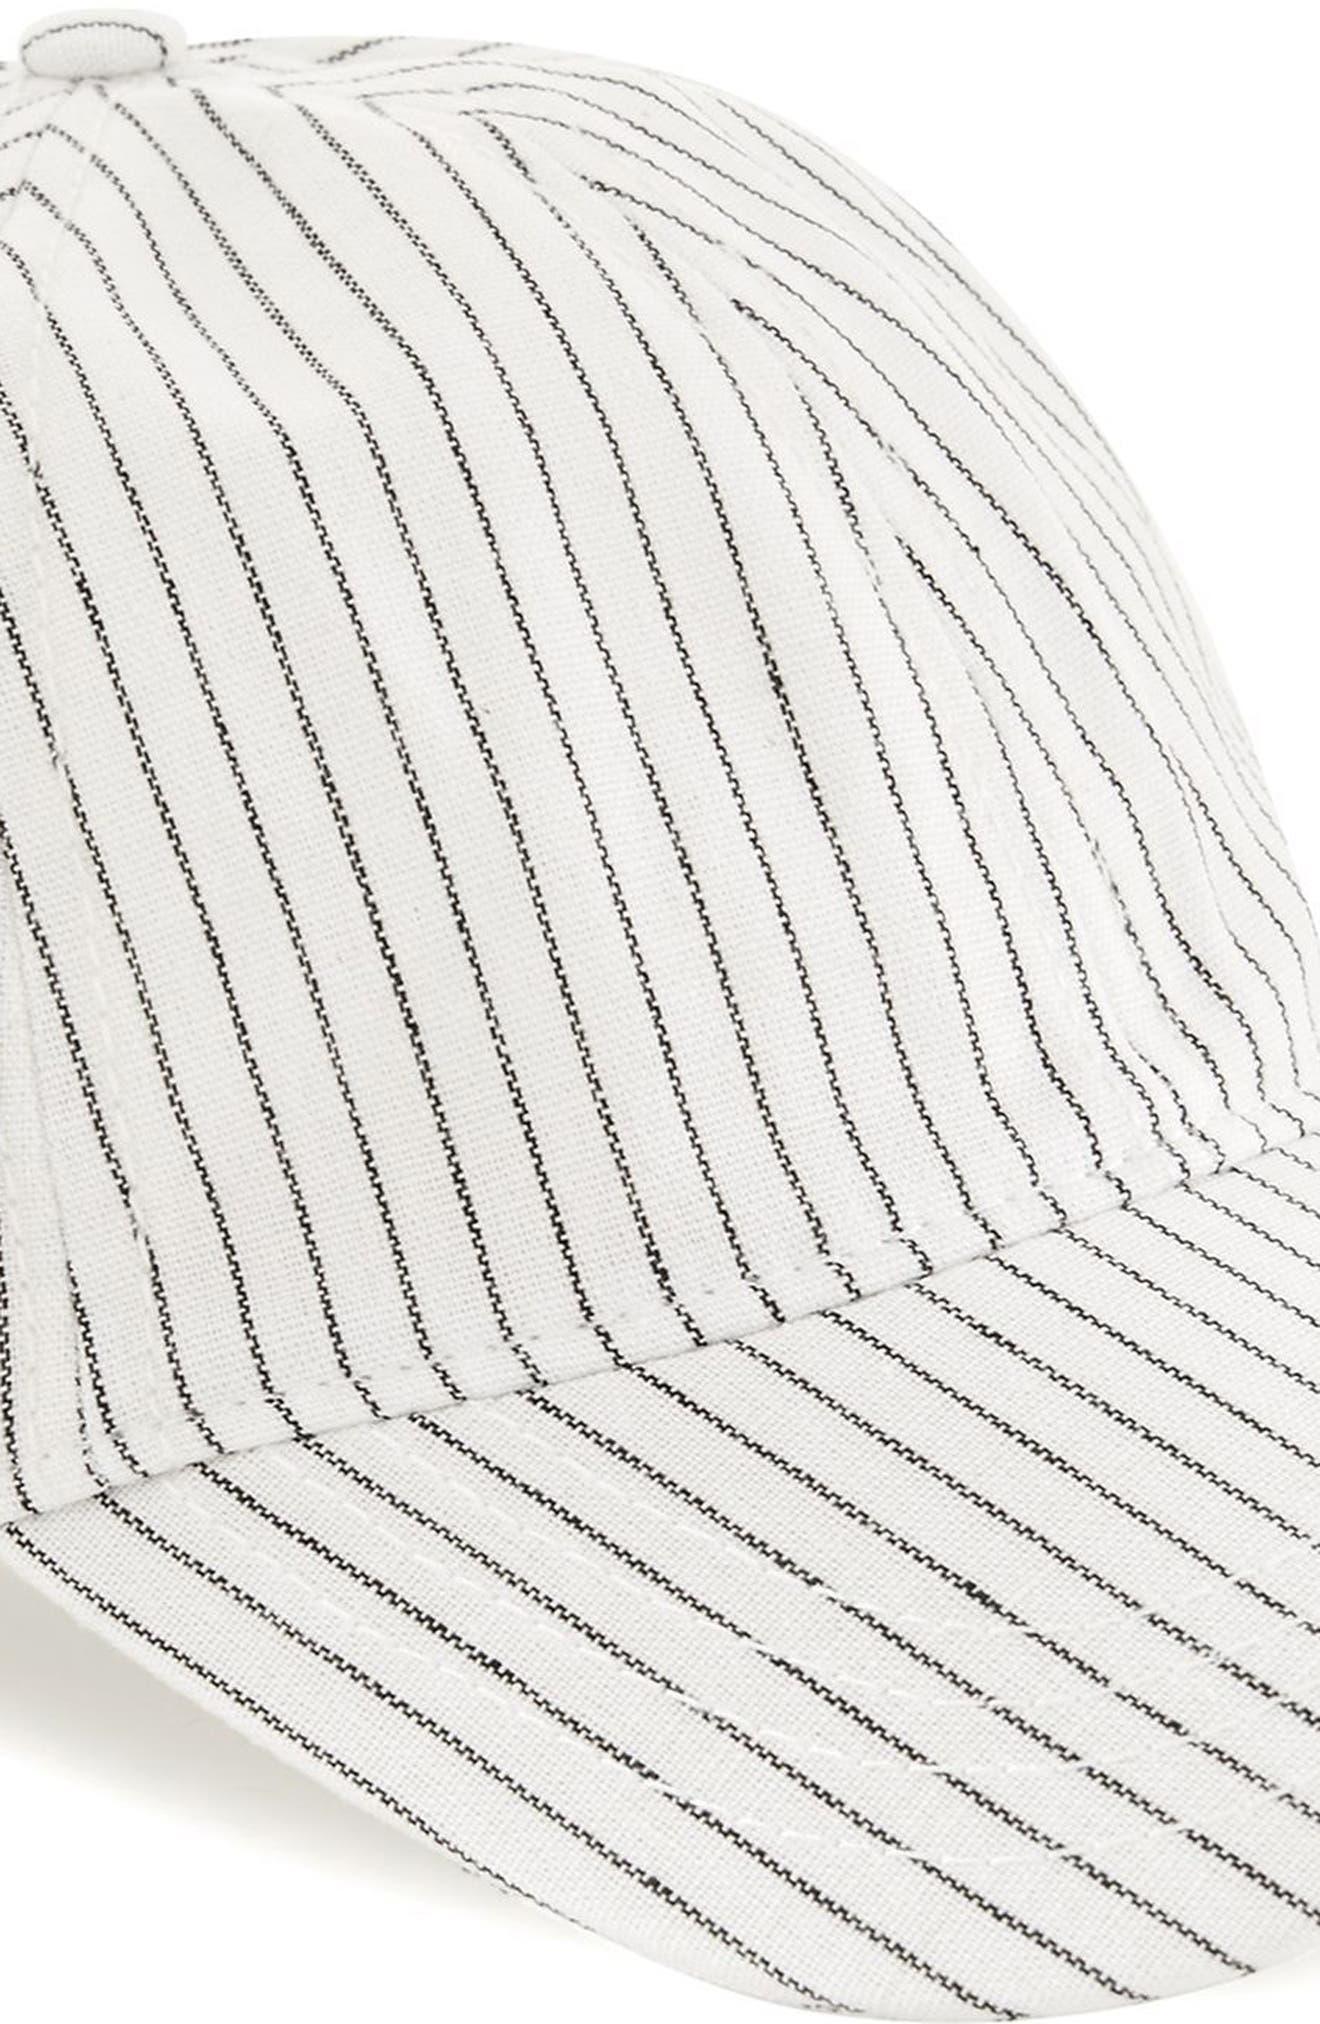 Stripe Boys Curved Peak Cap,                             Alternate thumbnail 3, color,                             White Multi